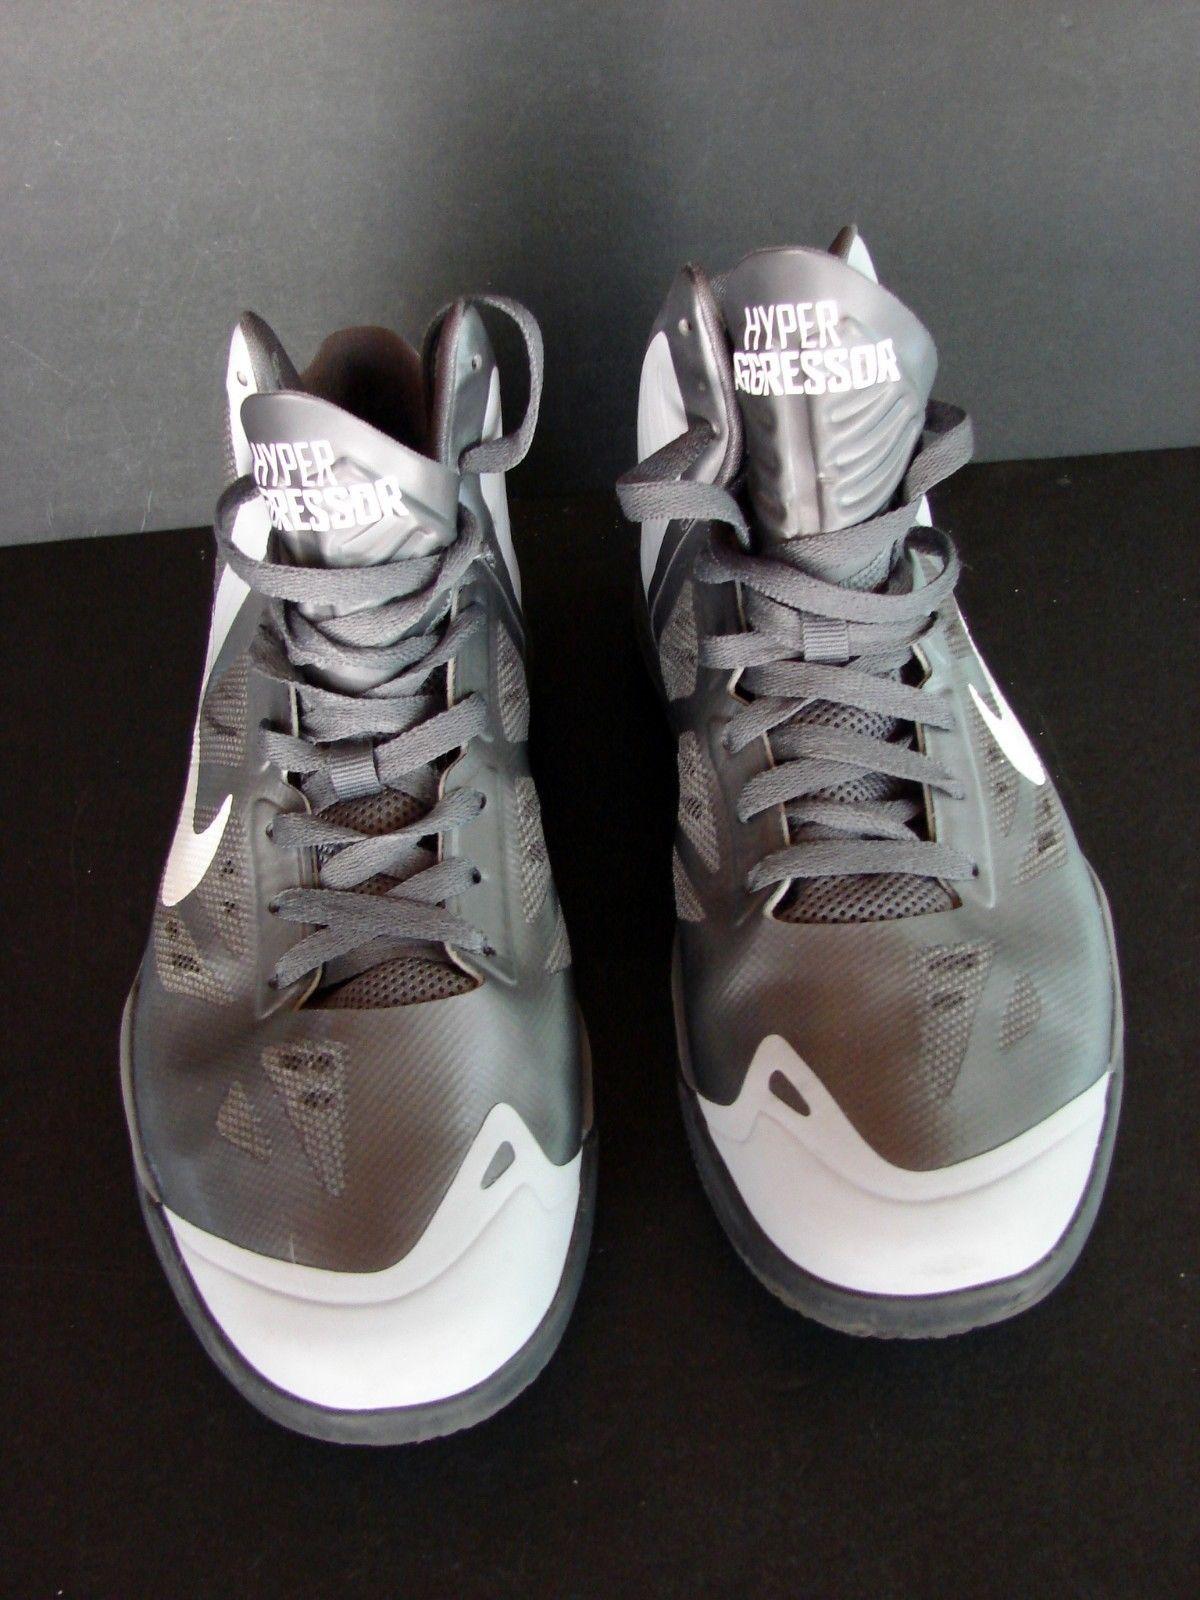 Gray Nike Air Max Hyper Aggressor Size 10.5 and 50 similar items